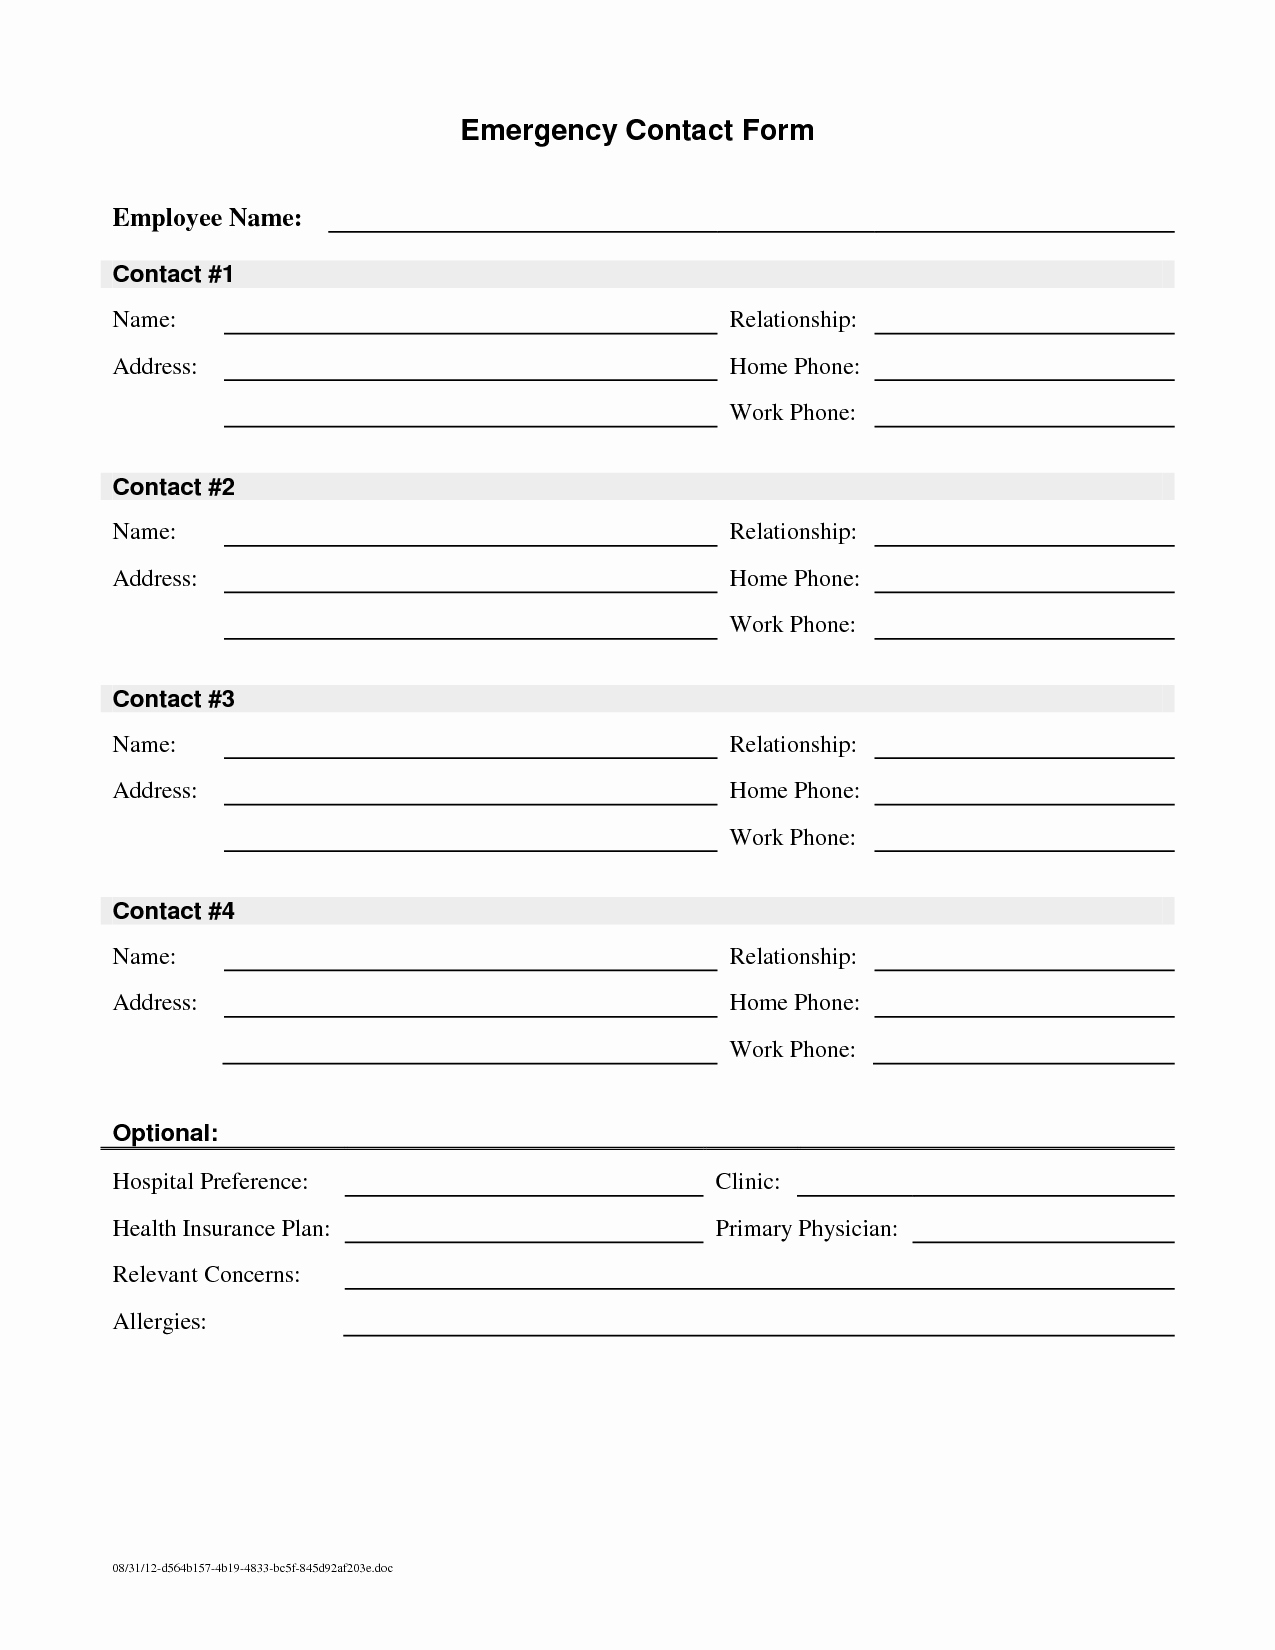 Emergency Contacts form Templates Unique Employee Emergency Contact Printable form to Pin